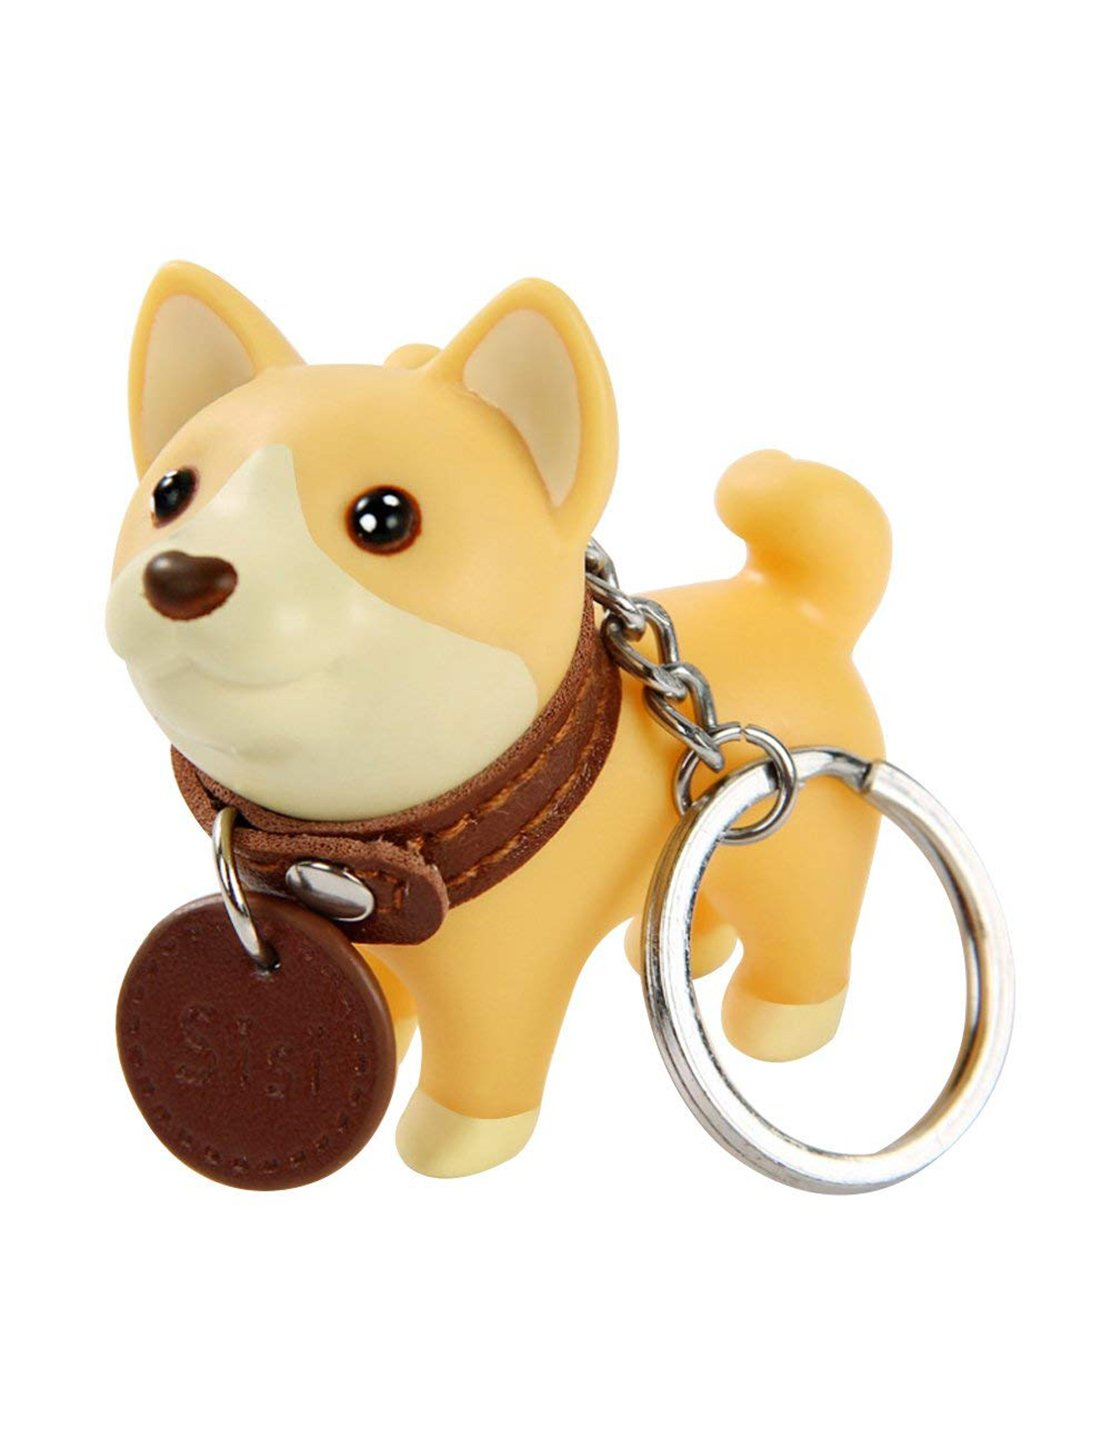 DomeStar Dog Keychain Charms, Shiba Inu Key Ring Cute Keychains Car Key Chain for Kids Adults